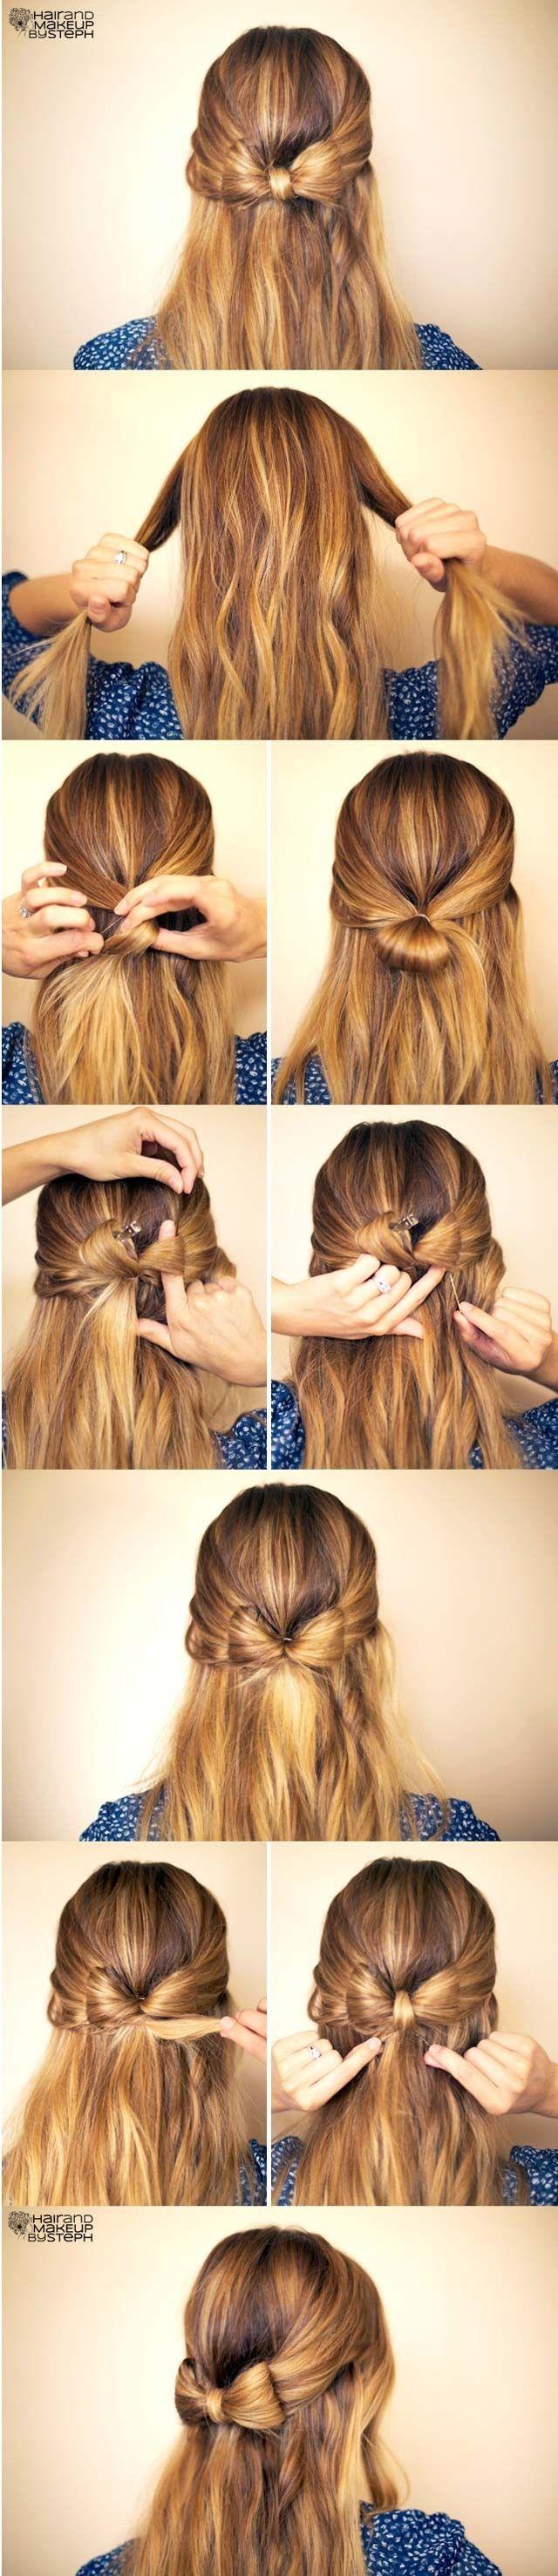 cute hairstyles stepbystep hairstyles for long hair hair bow